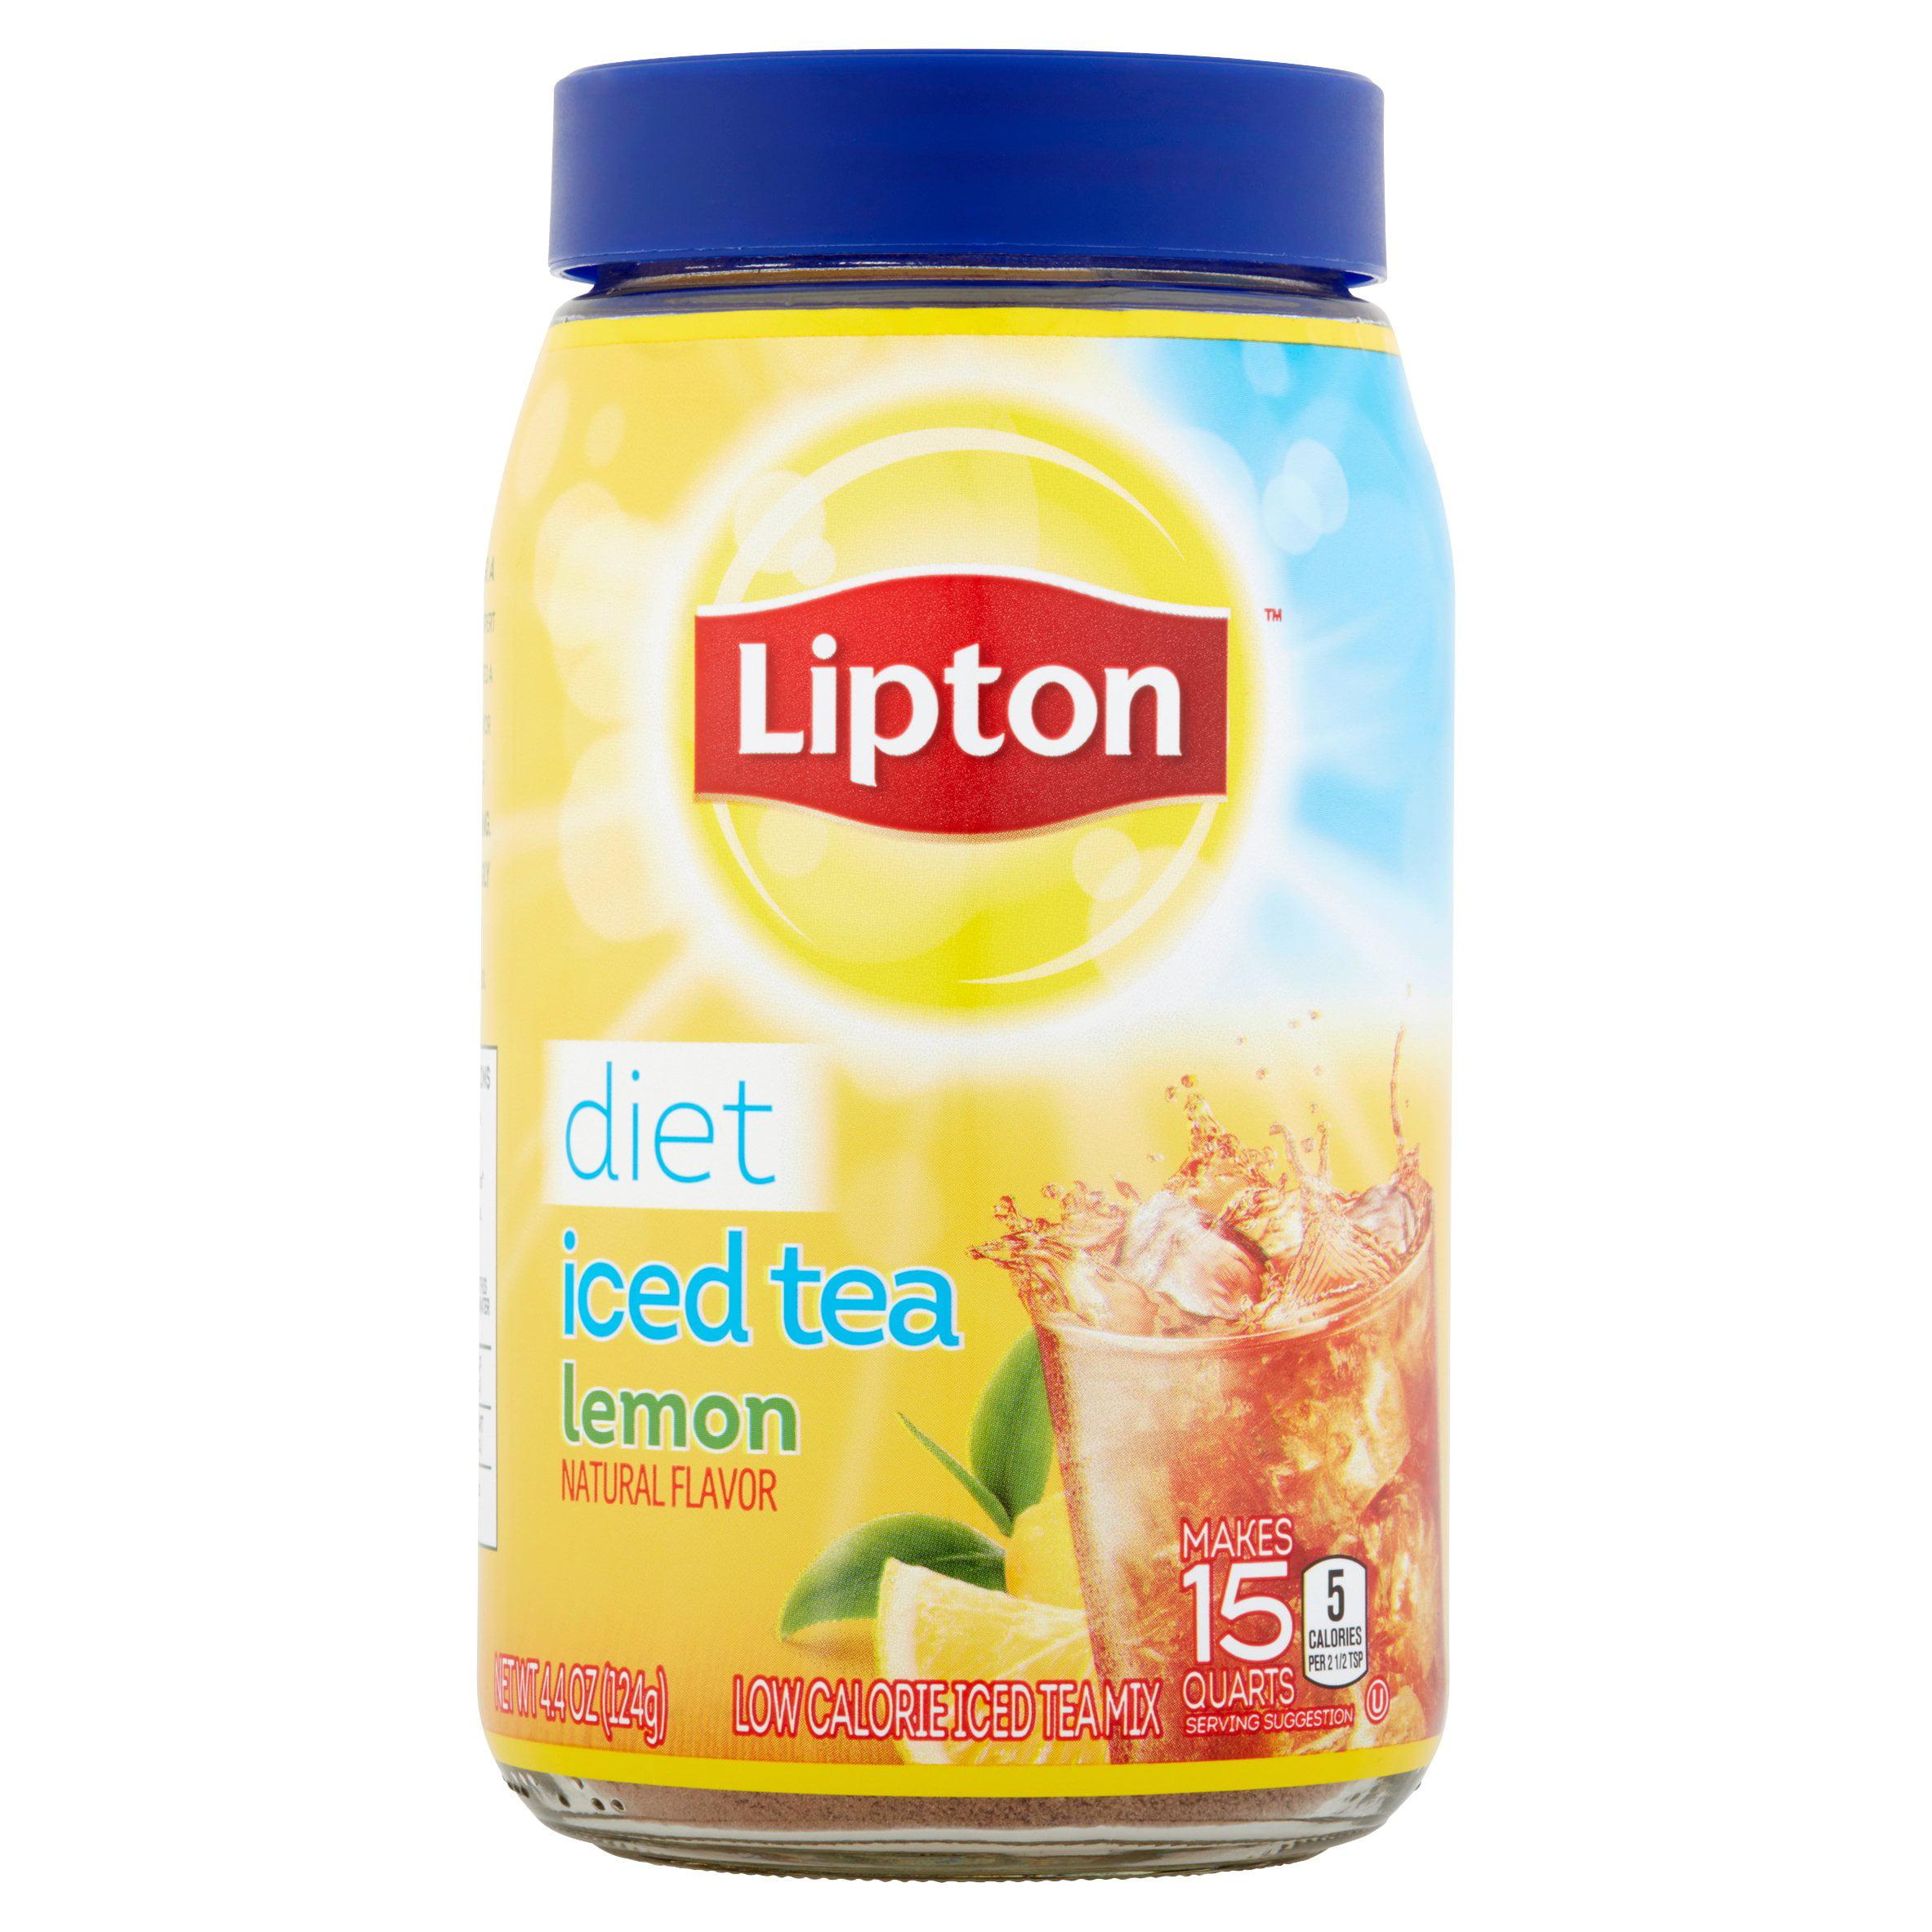 Lipton Iced Tea Mix Diet Lemon, 15 qt